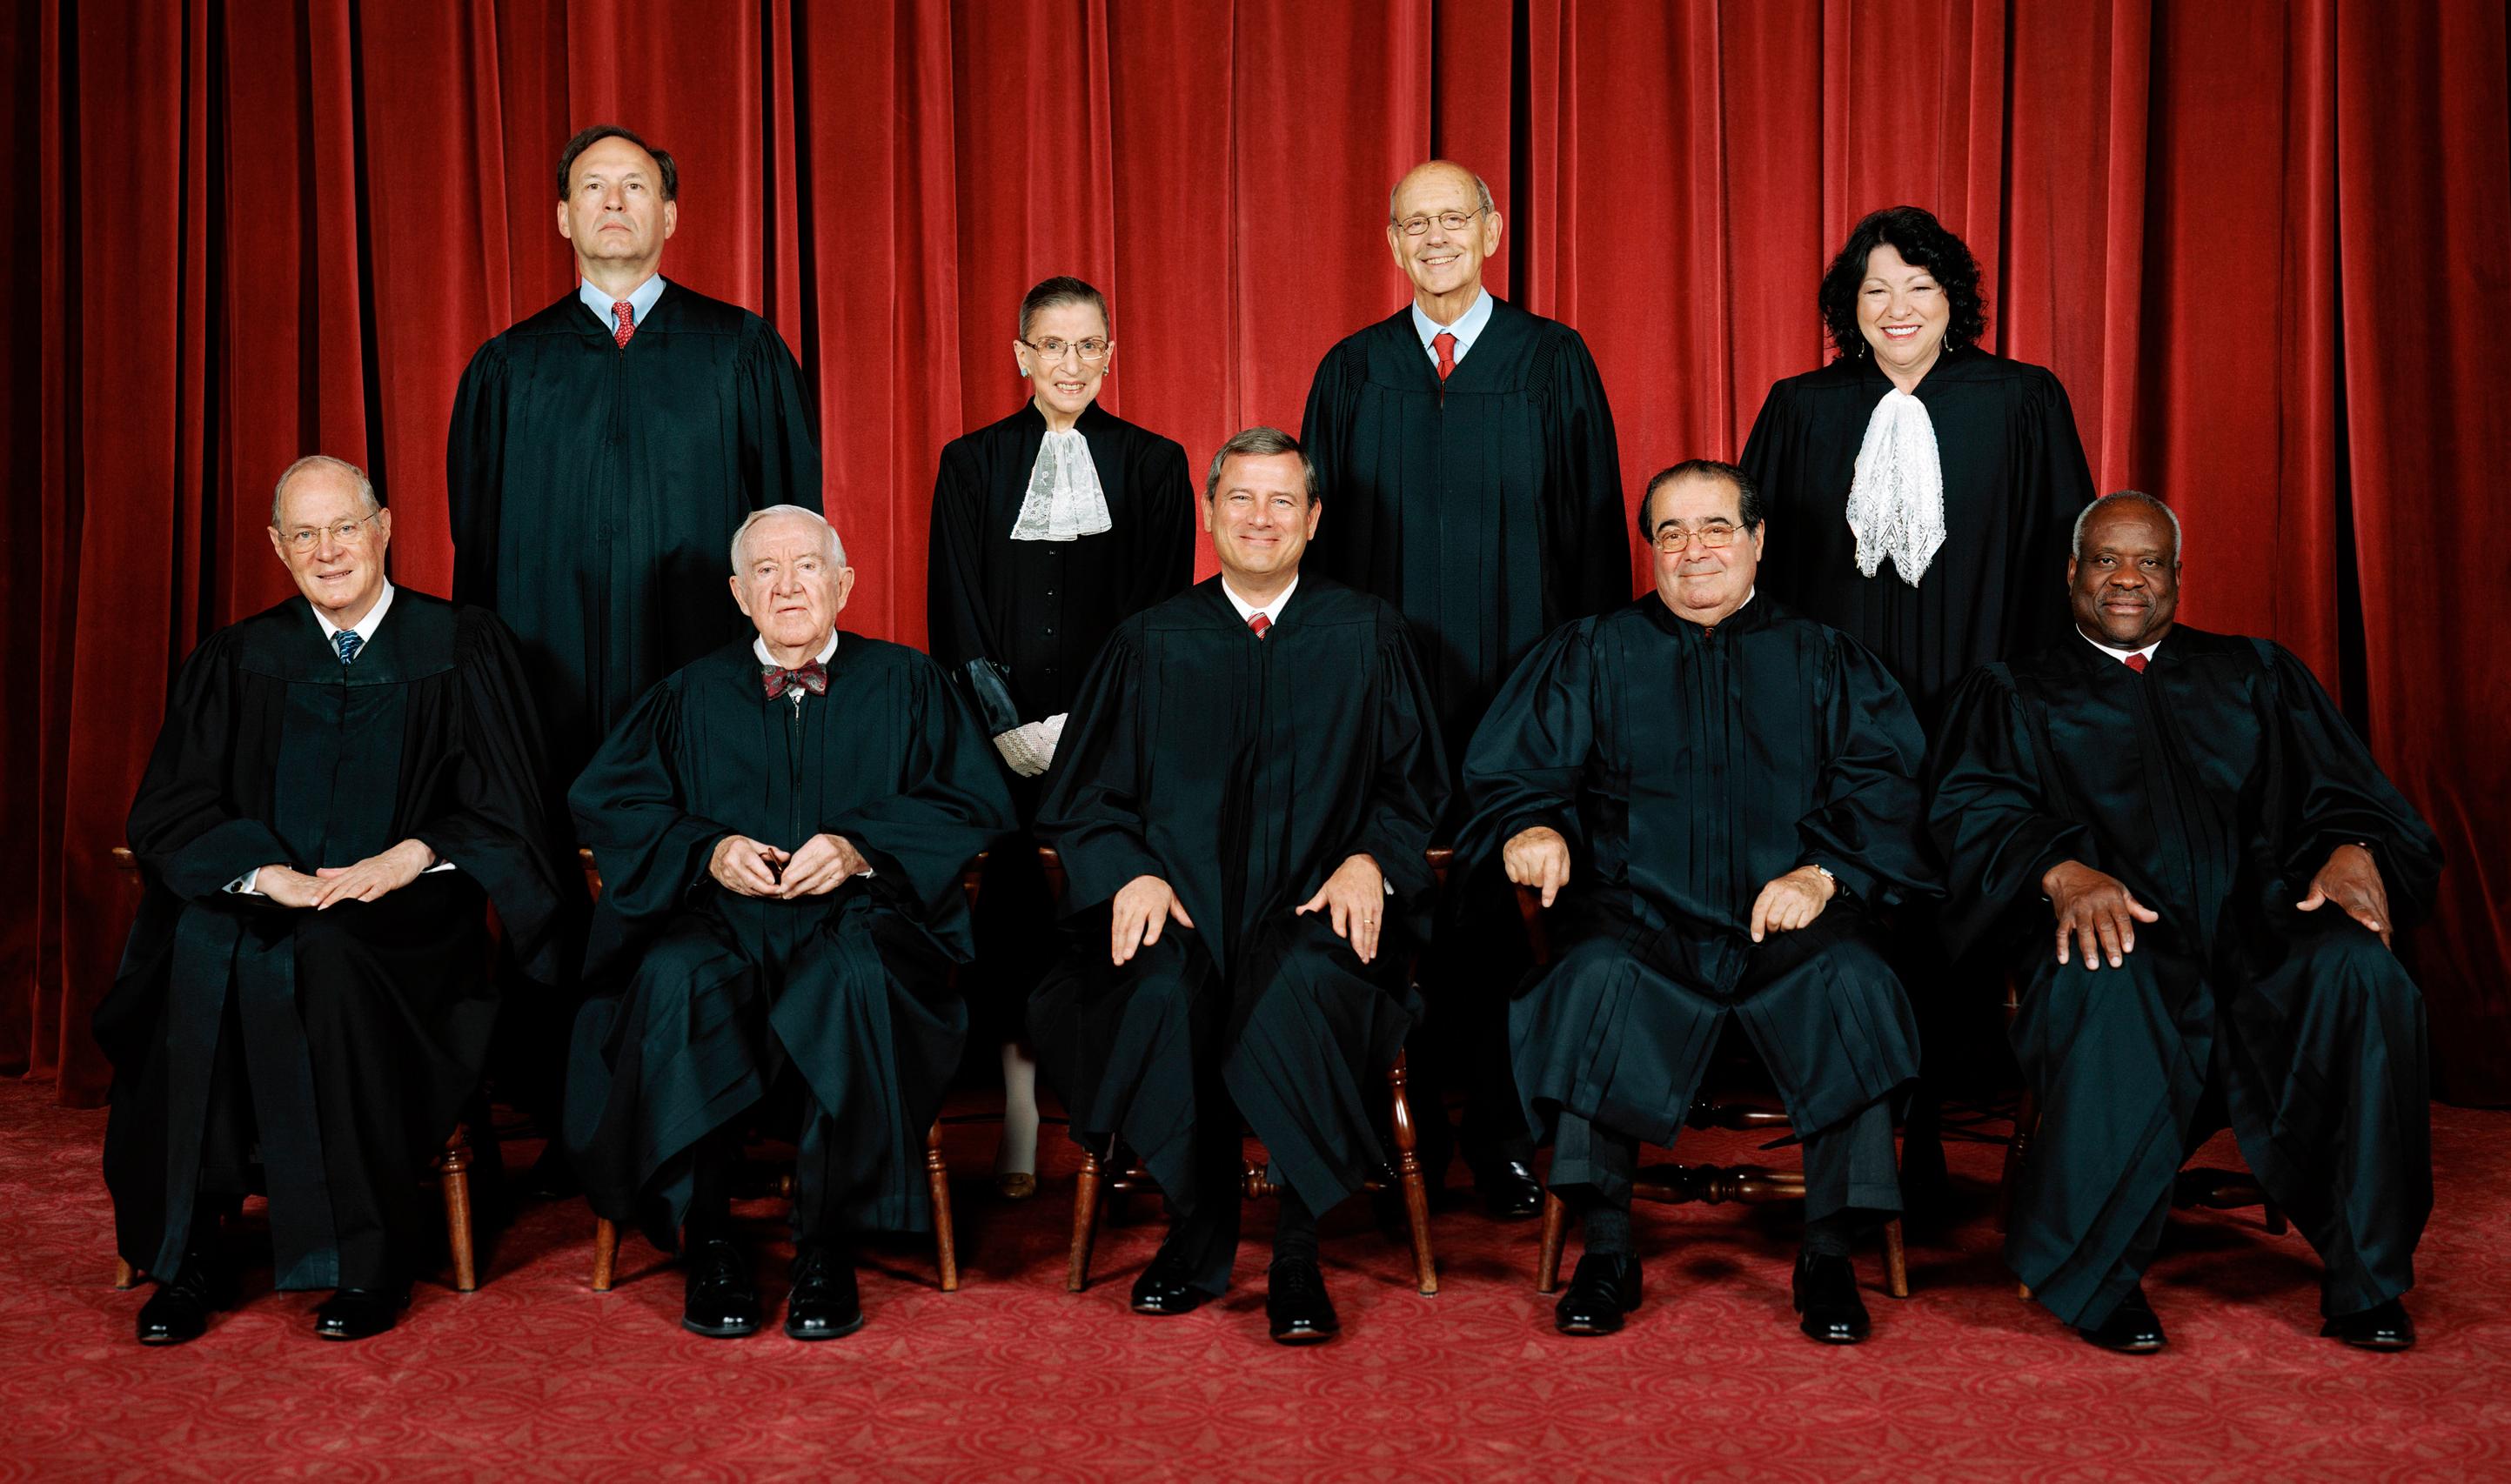 Supreme_Court_US_2009